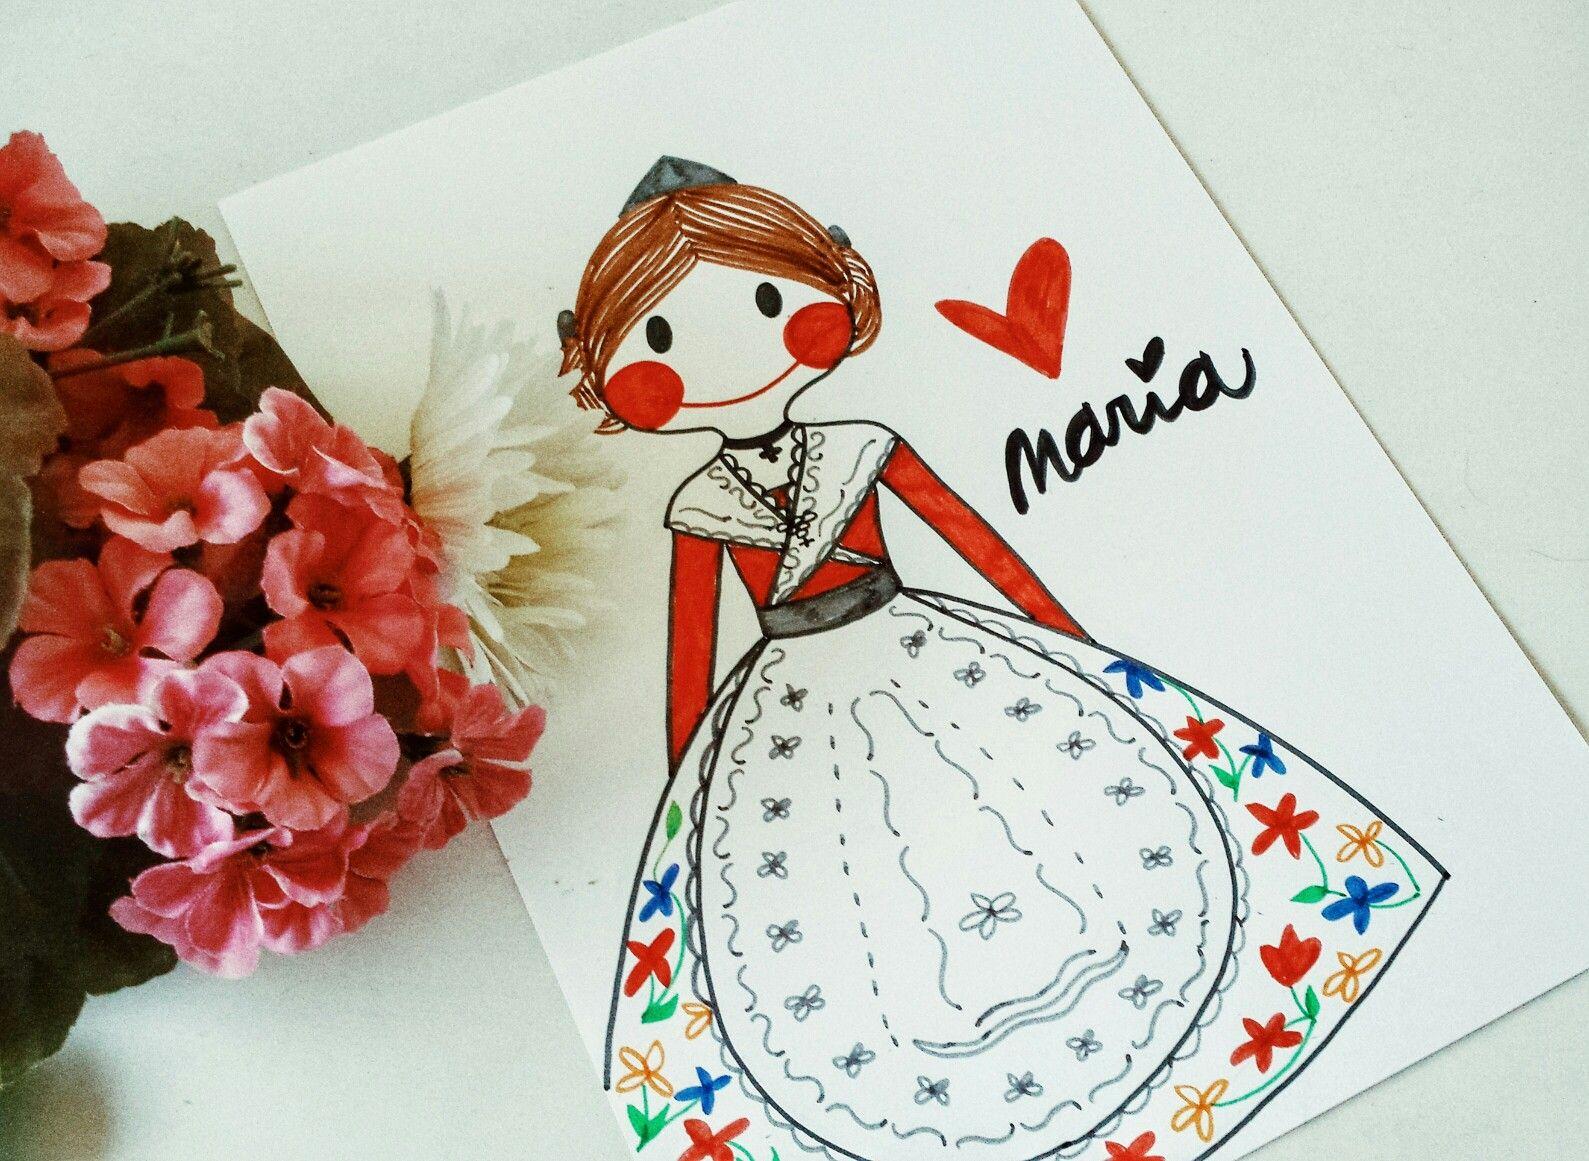 #abrazadaamialmohada #almohadaspersonalizadas #almohadaspintadasamano #ilustracion #illustration #handmade #pintadoamano